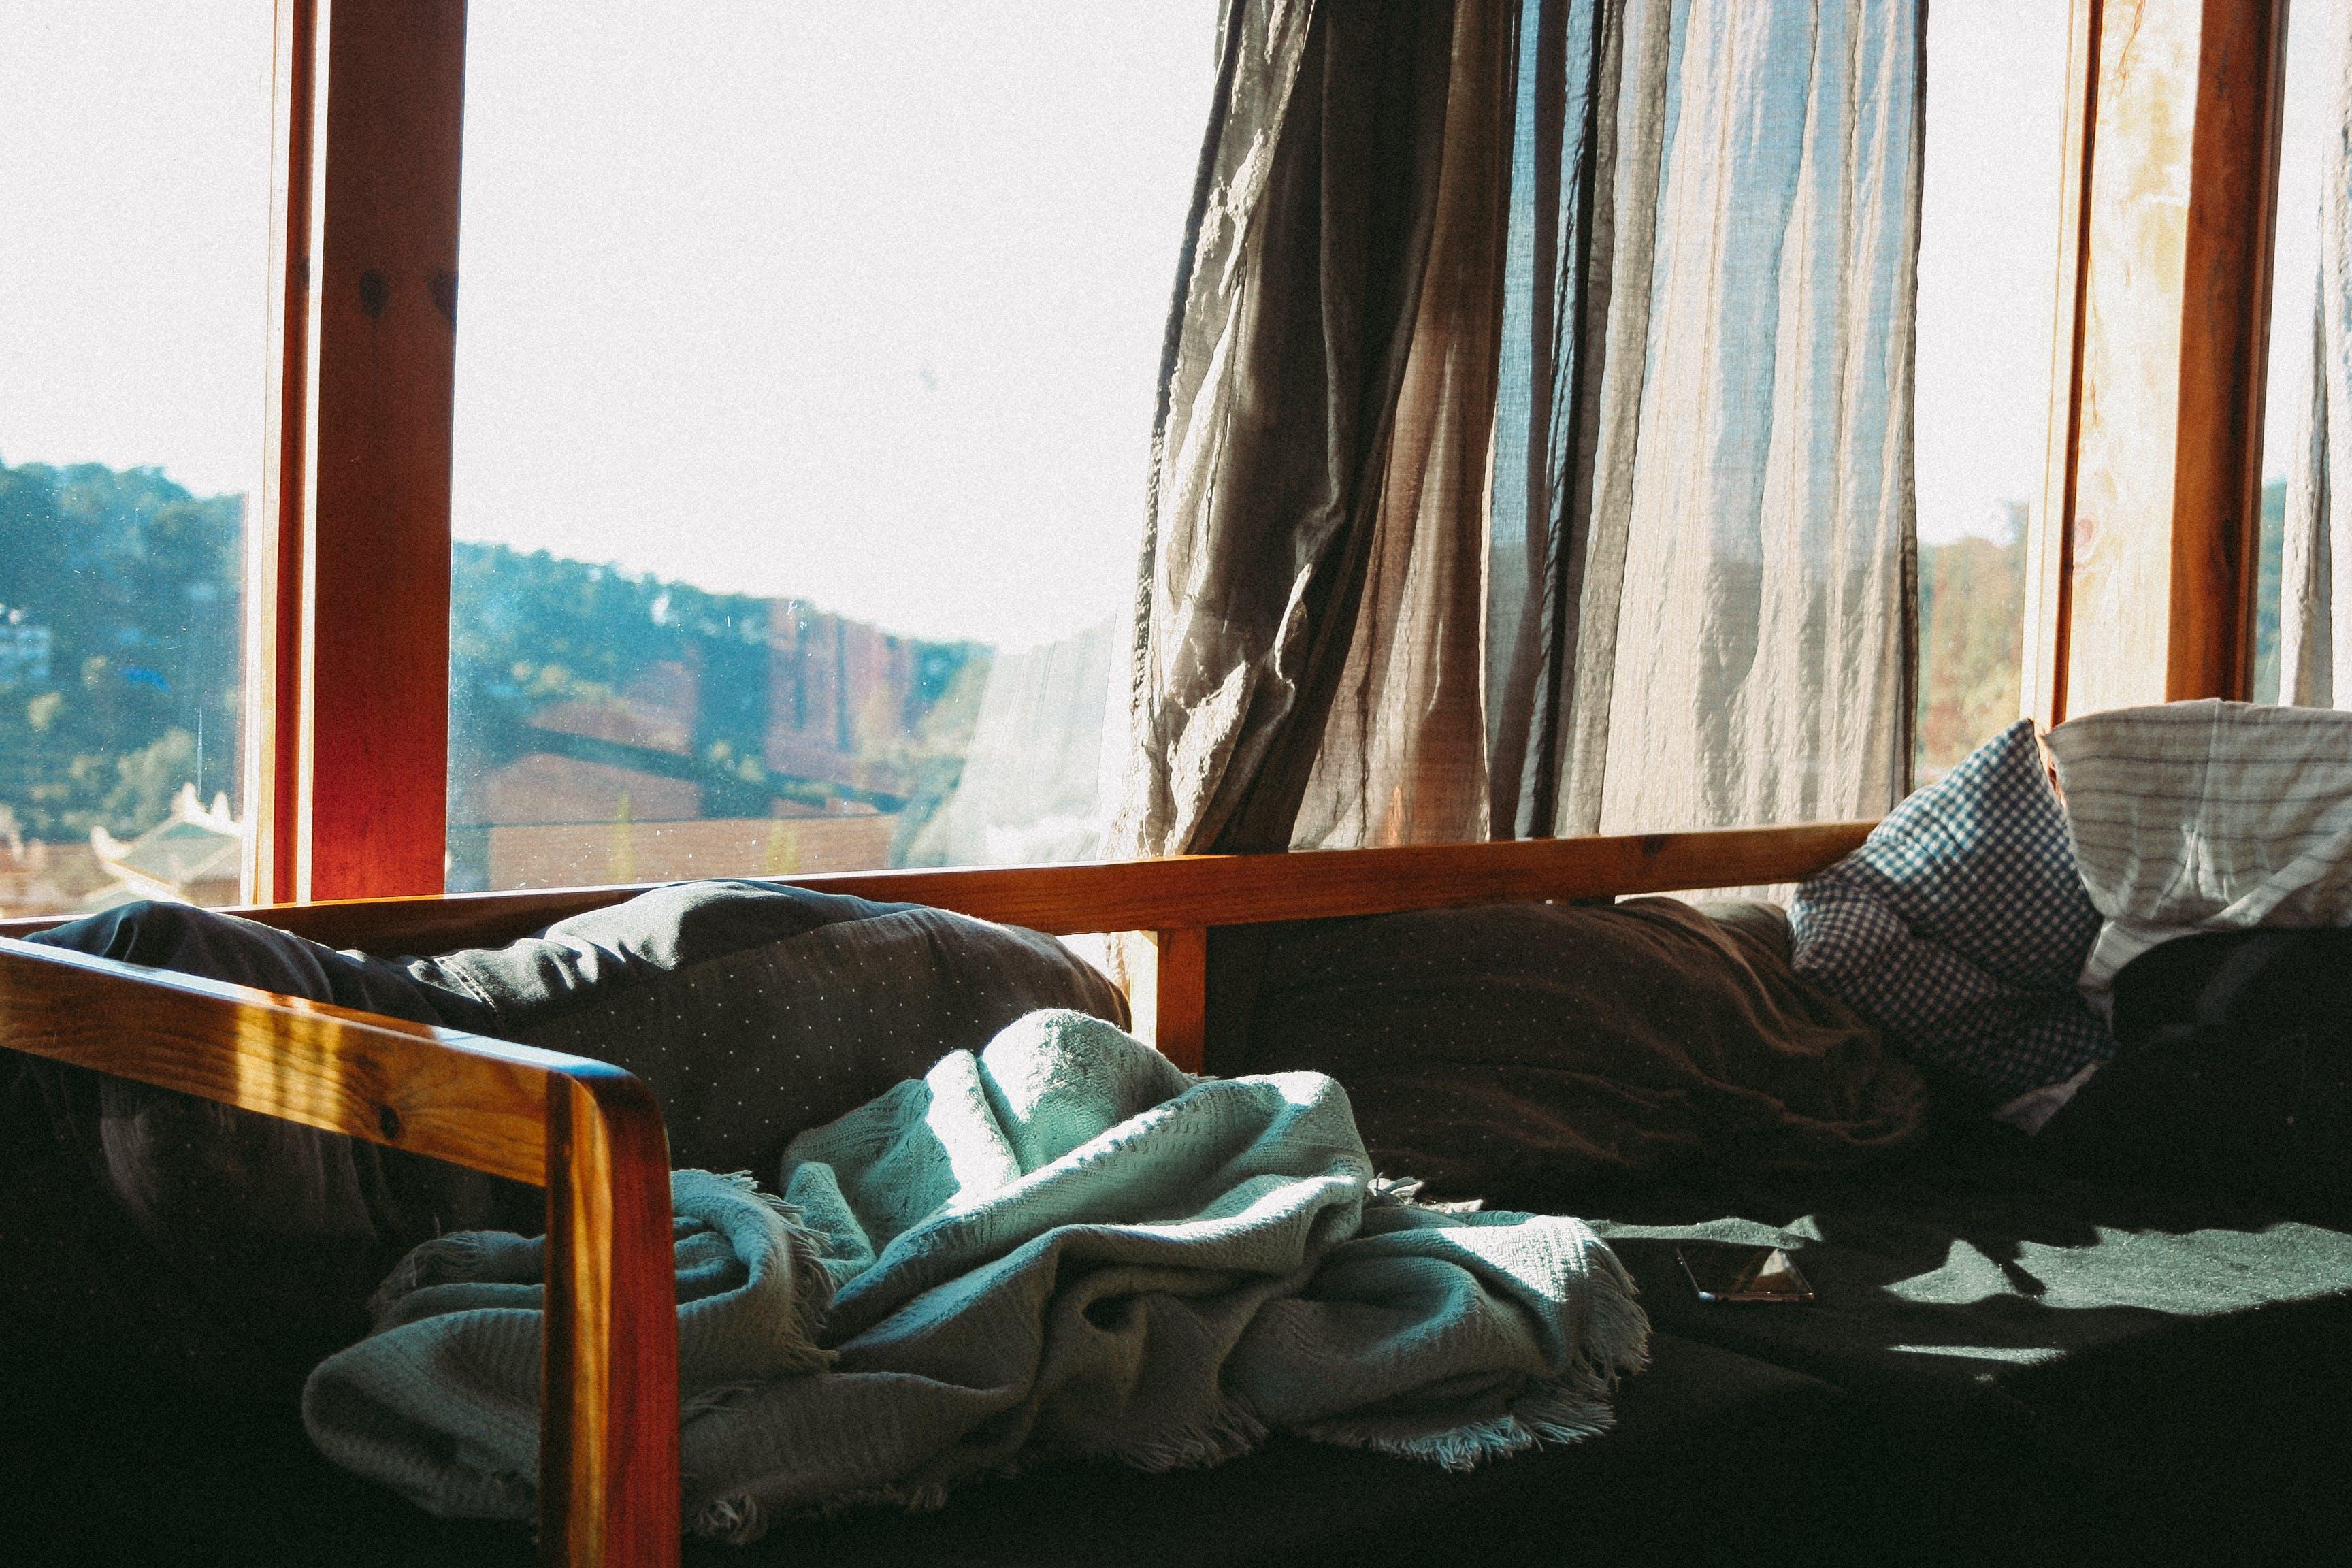 Brown Bed Beside Glass Window